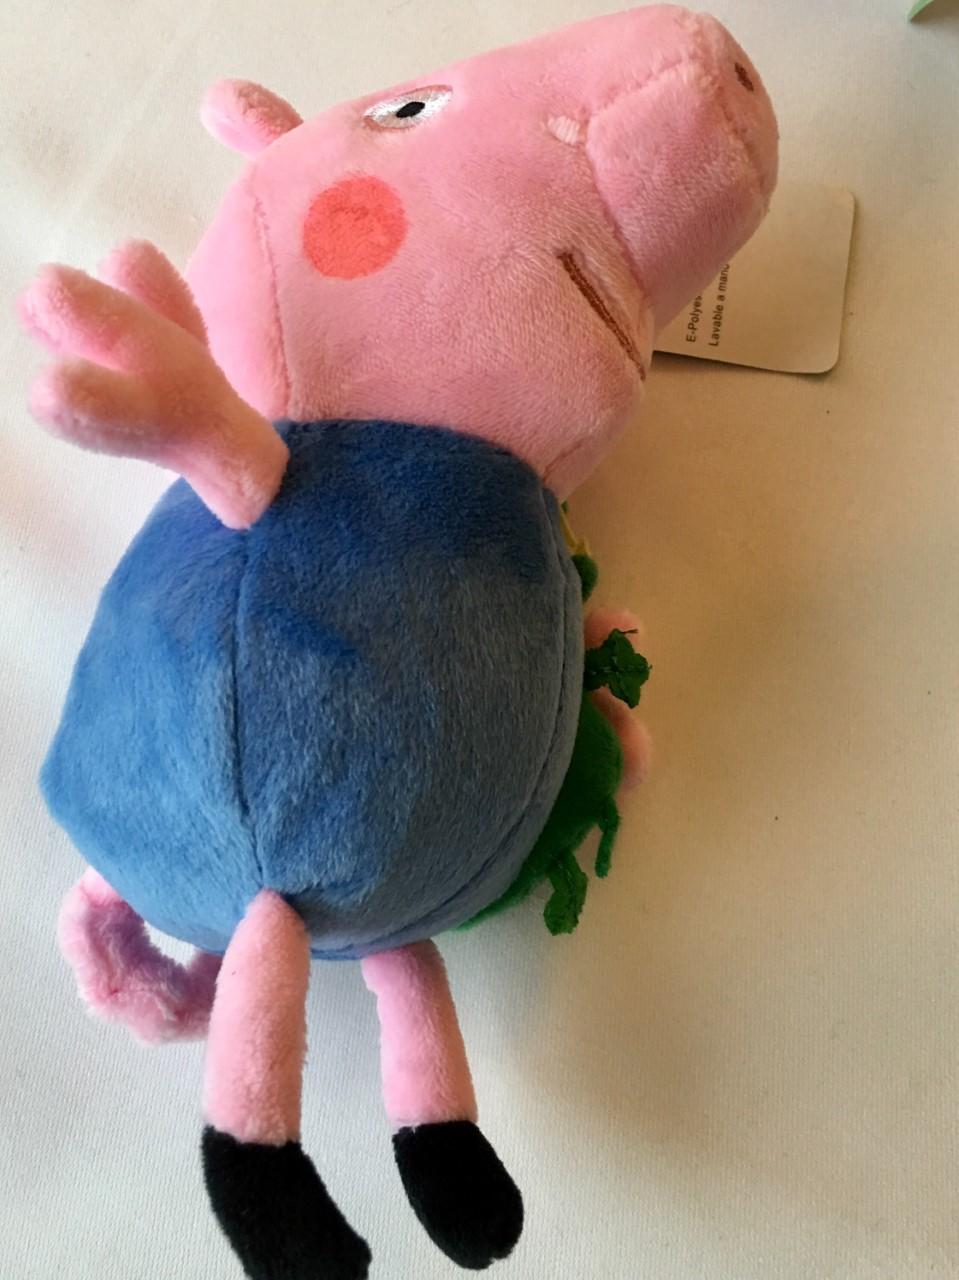 Fake Peppa Pig